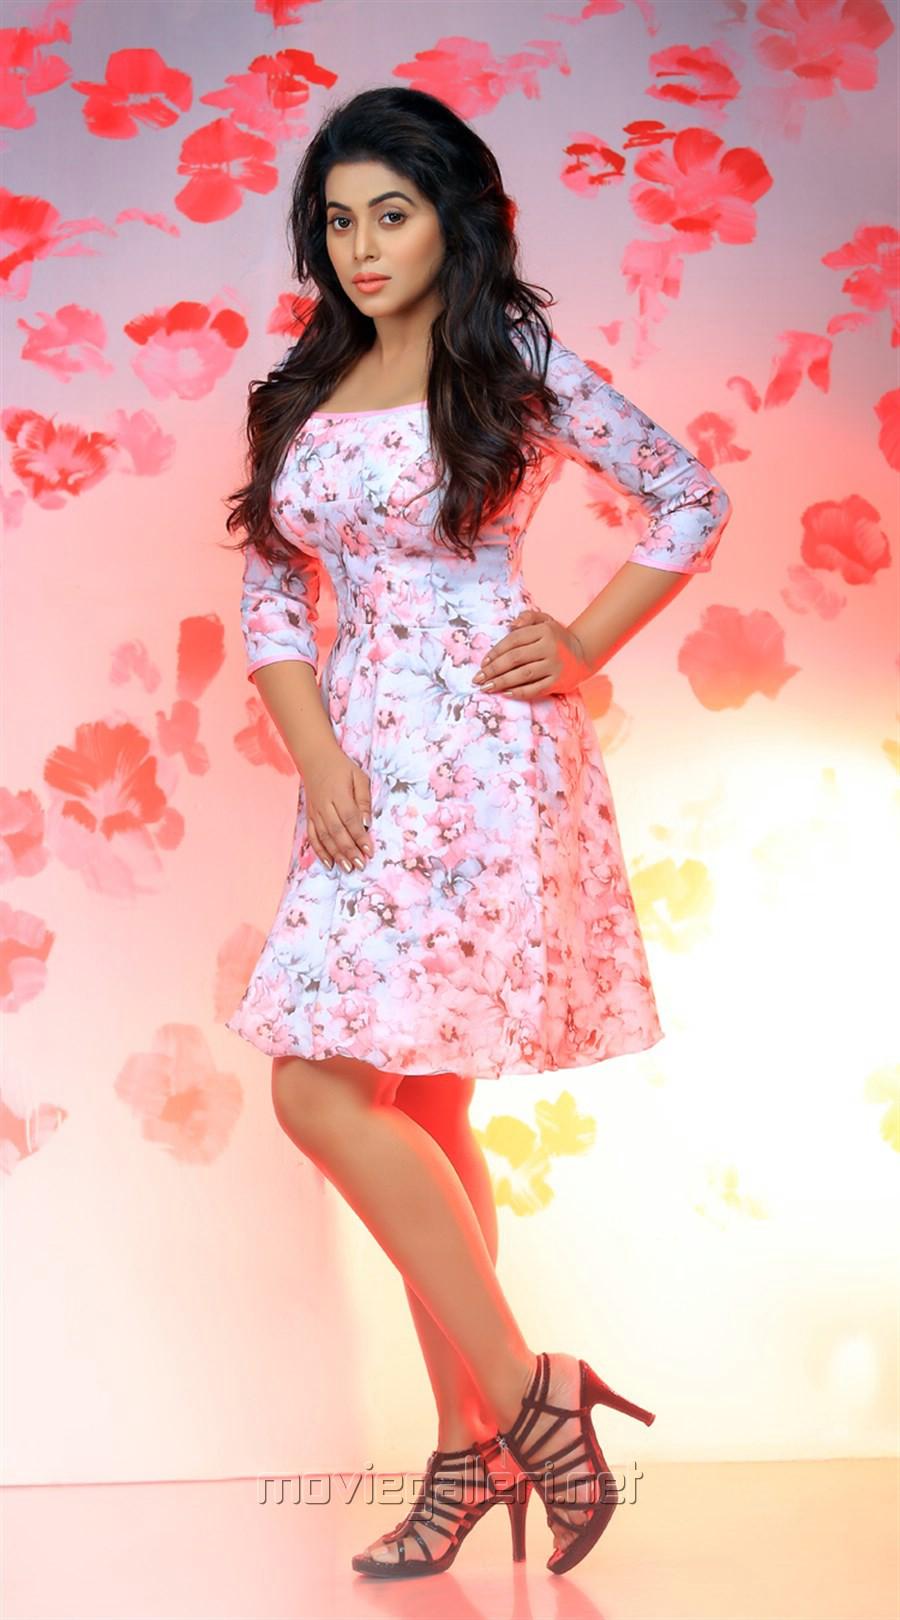 Actress Poorna Hot Photoshoot Stills